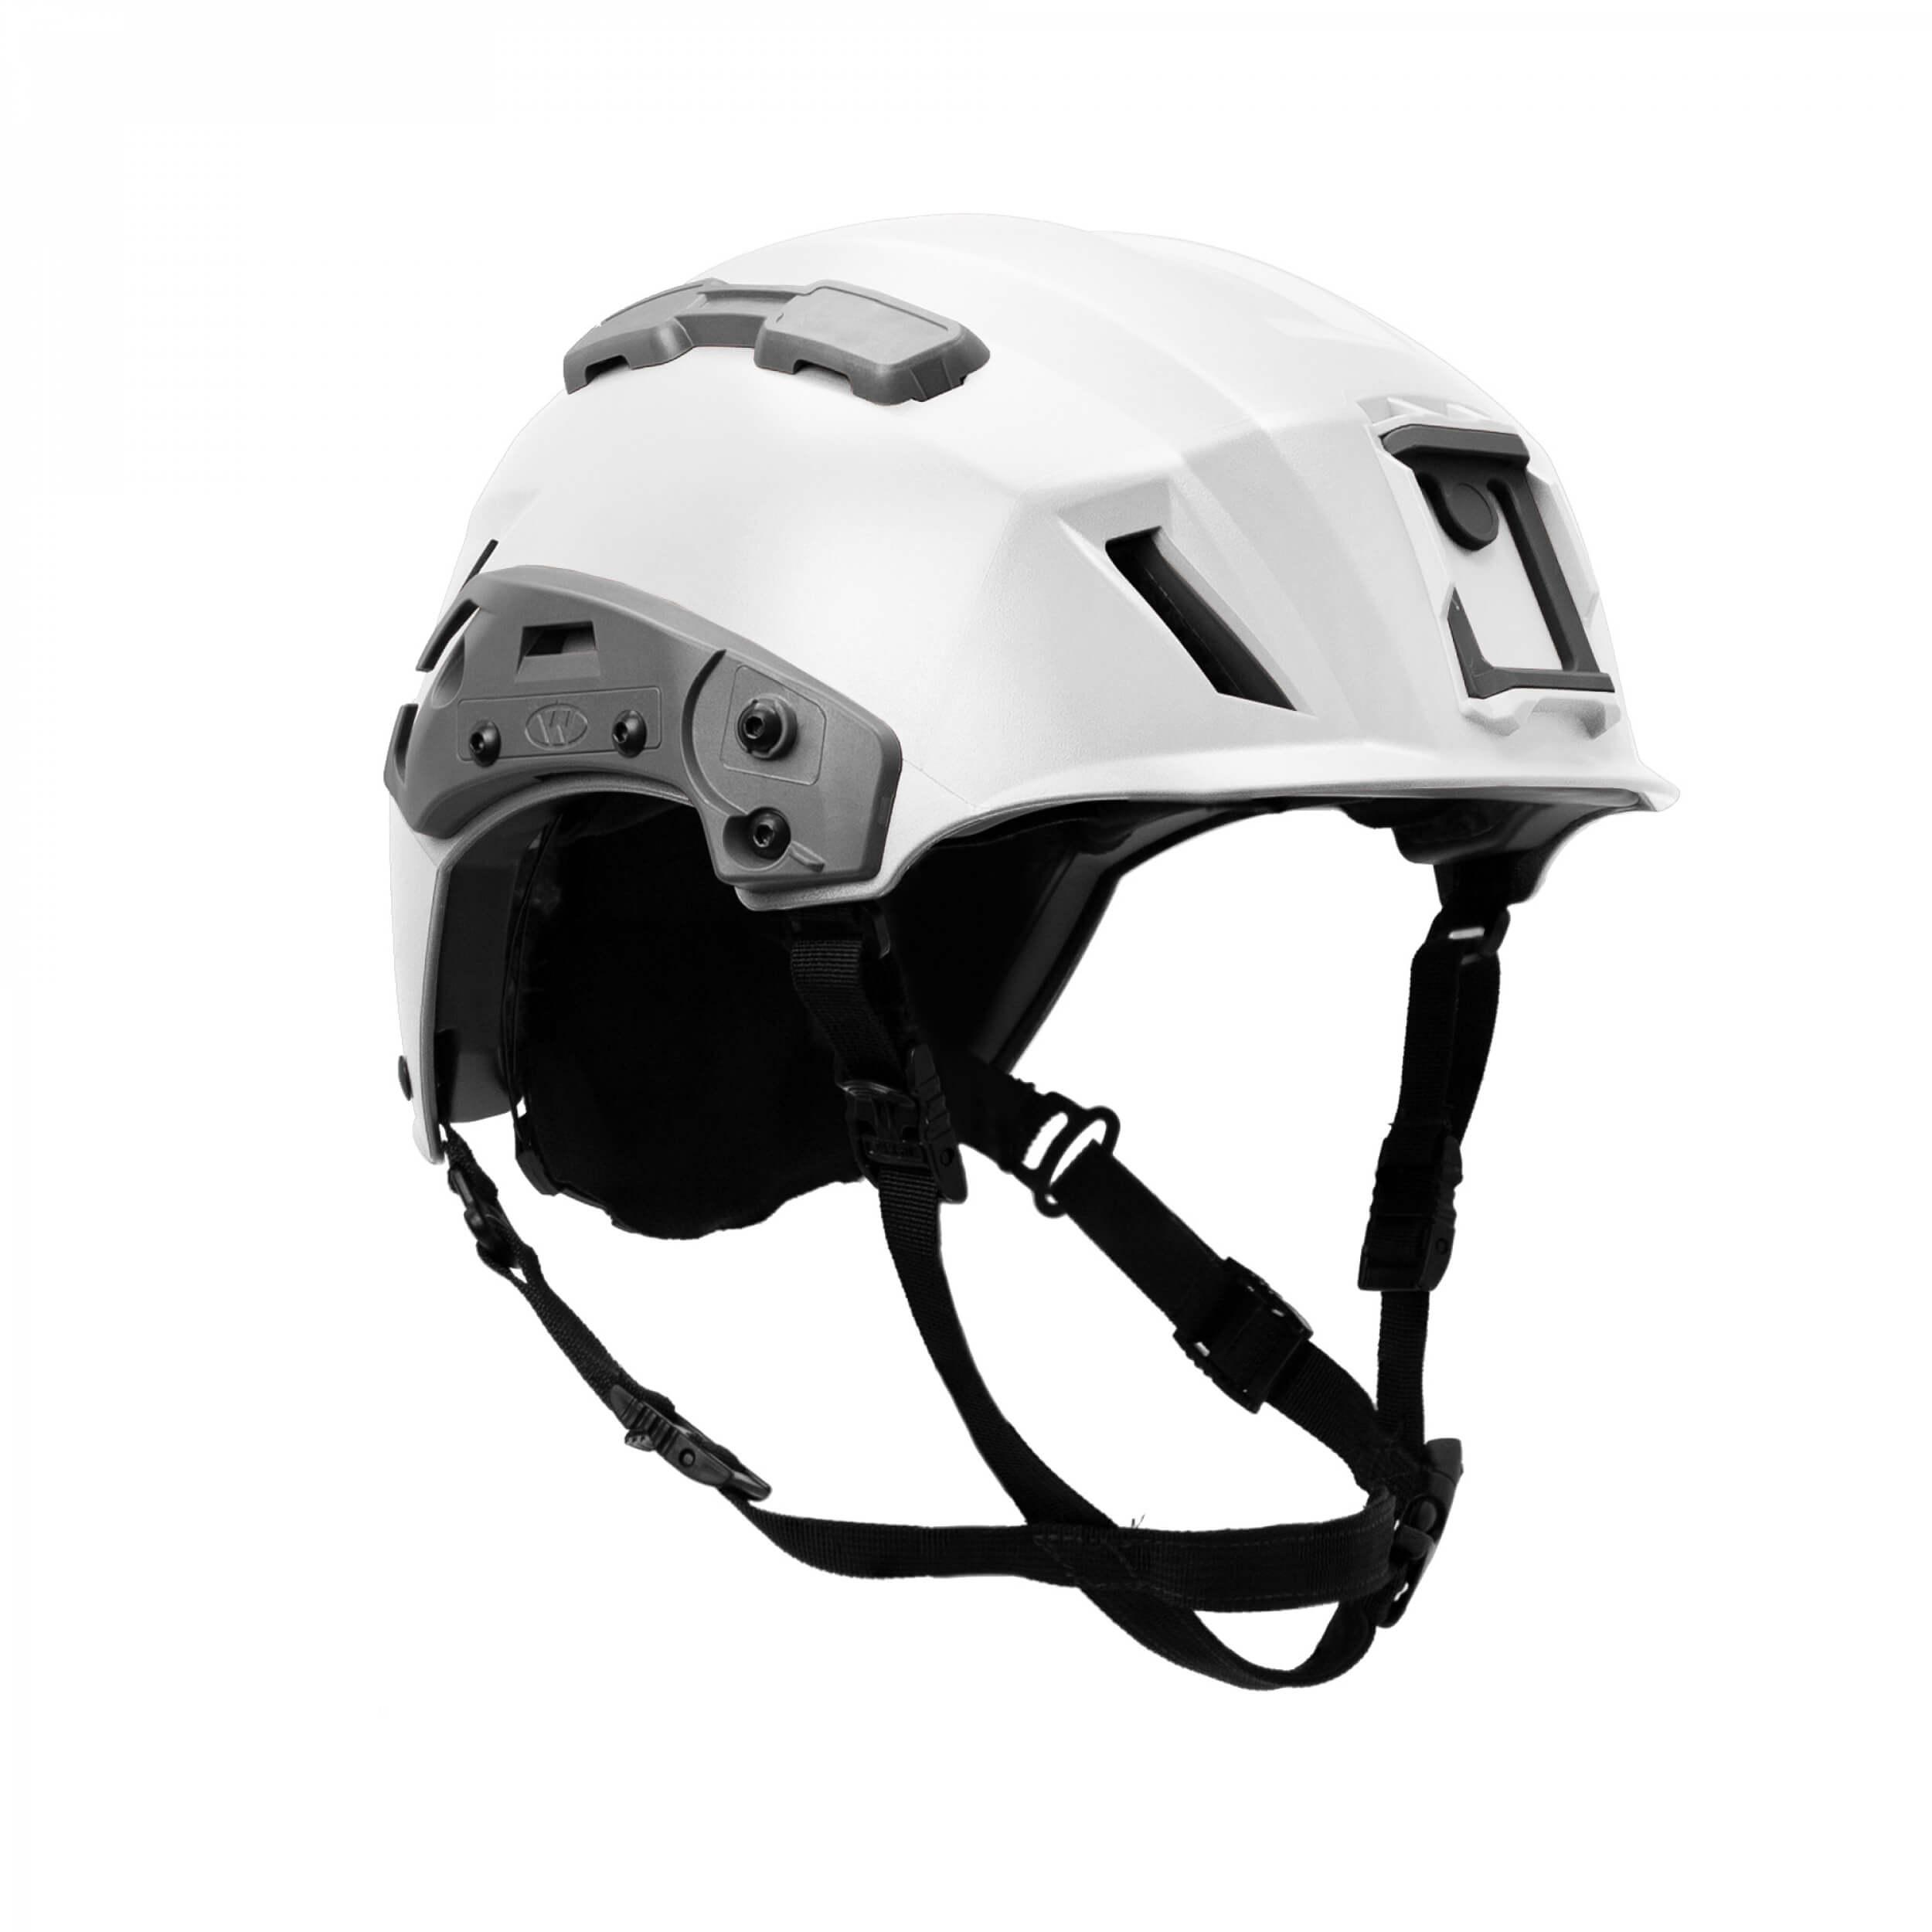 Team Wendy EXFIL SAR Tactical Helmet white